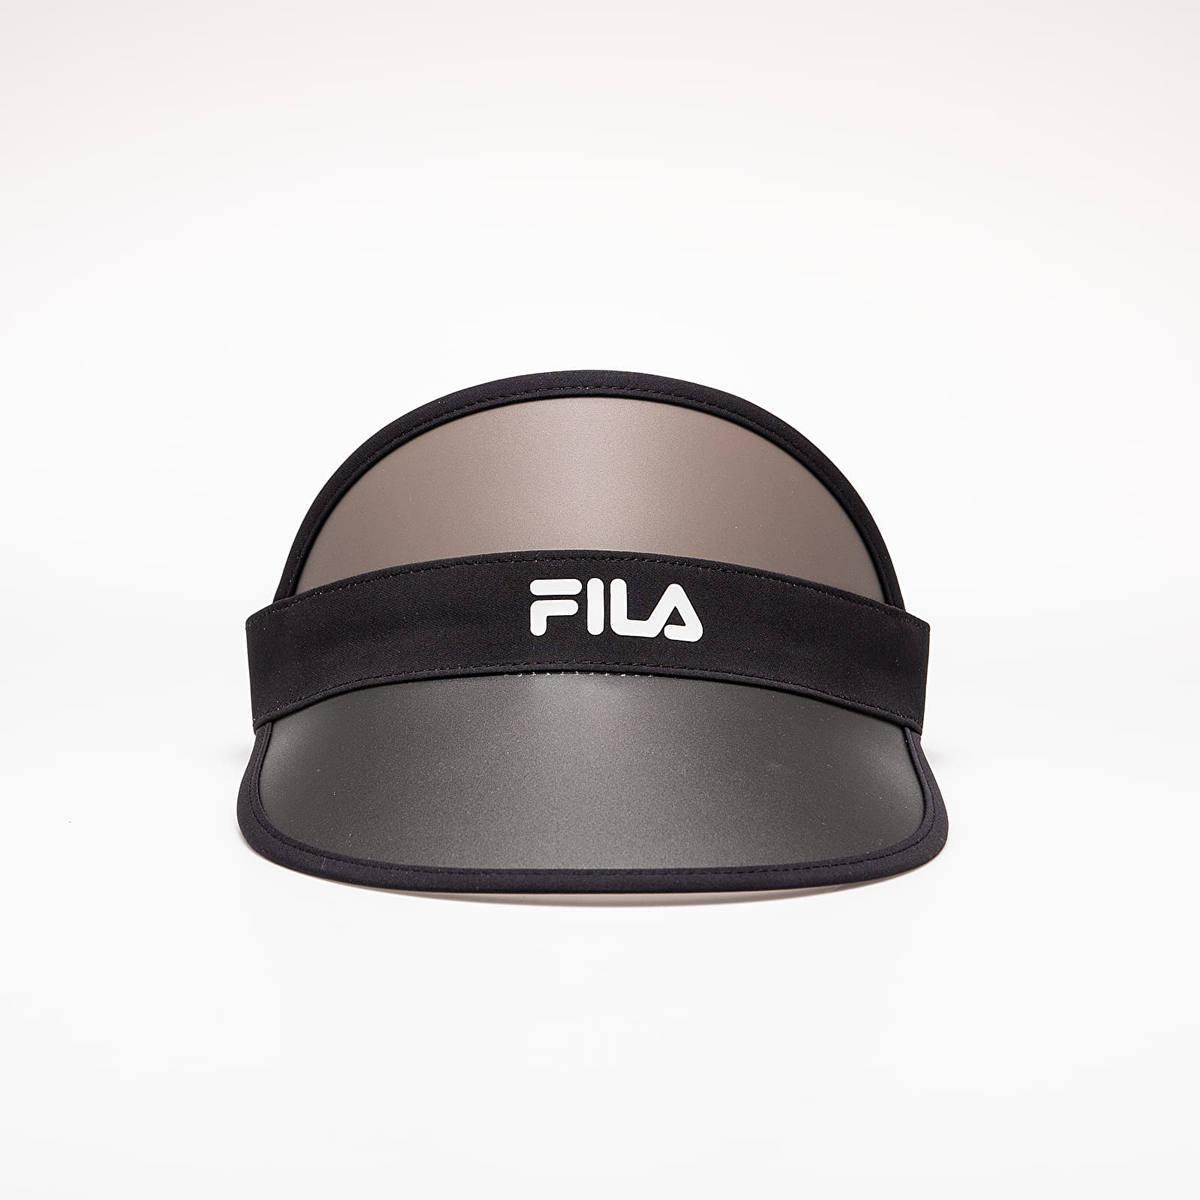 fila plastic visor